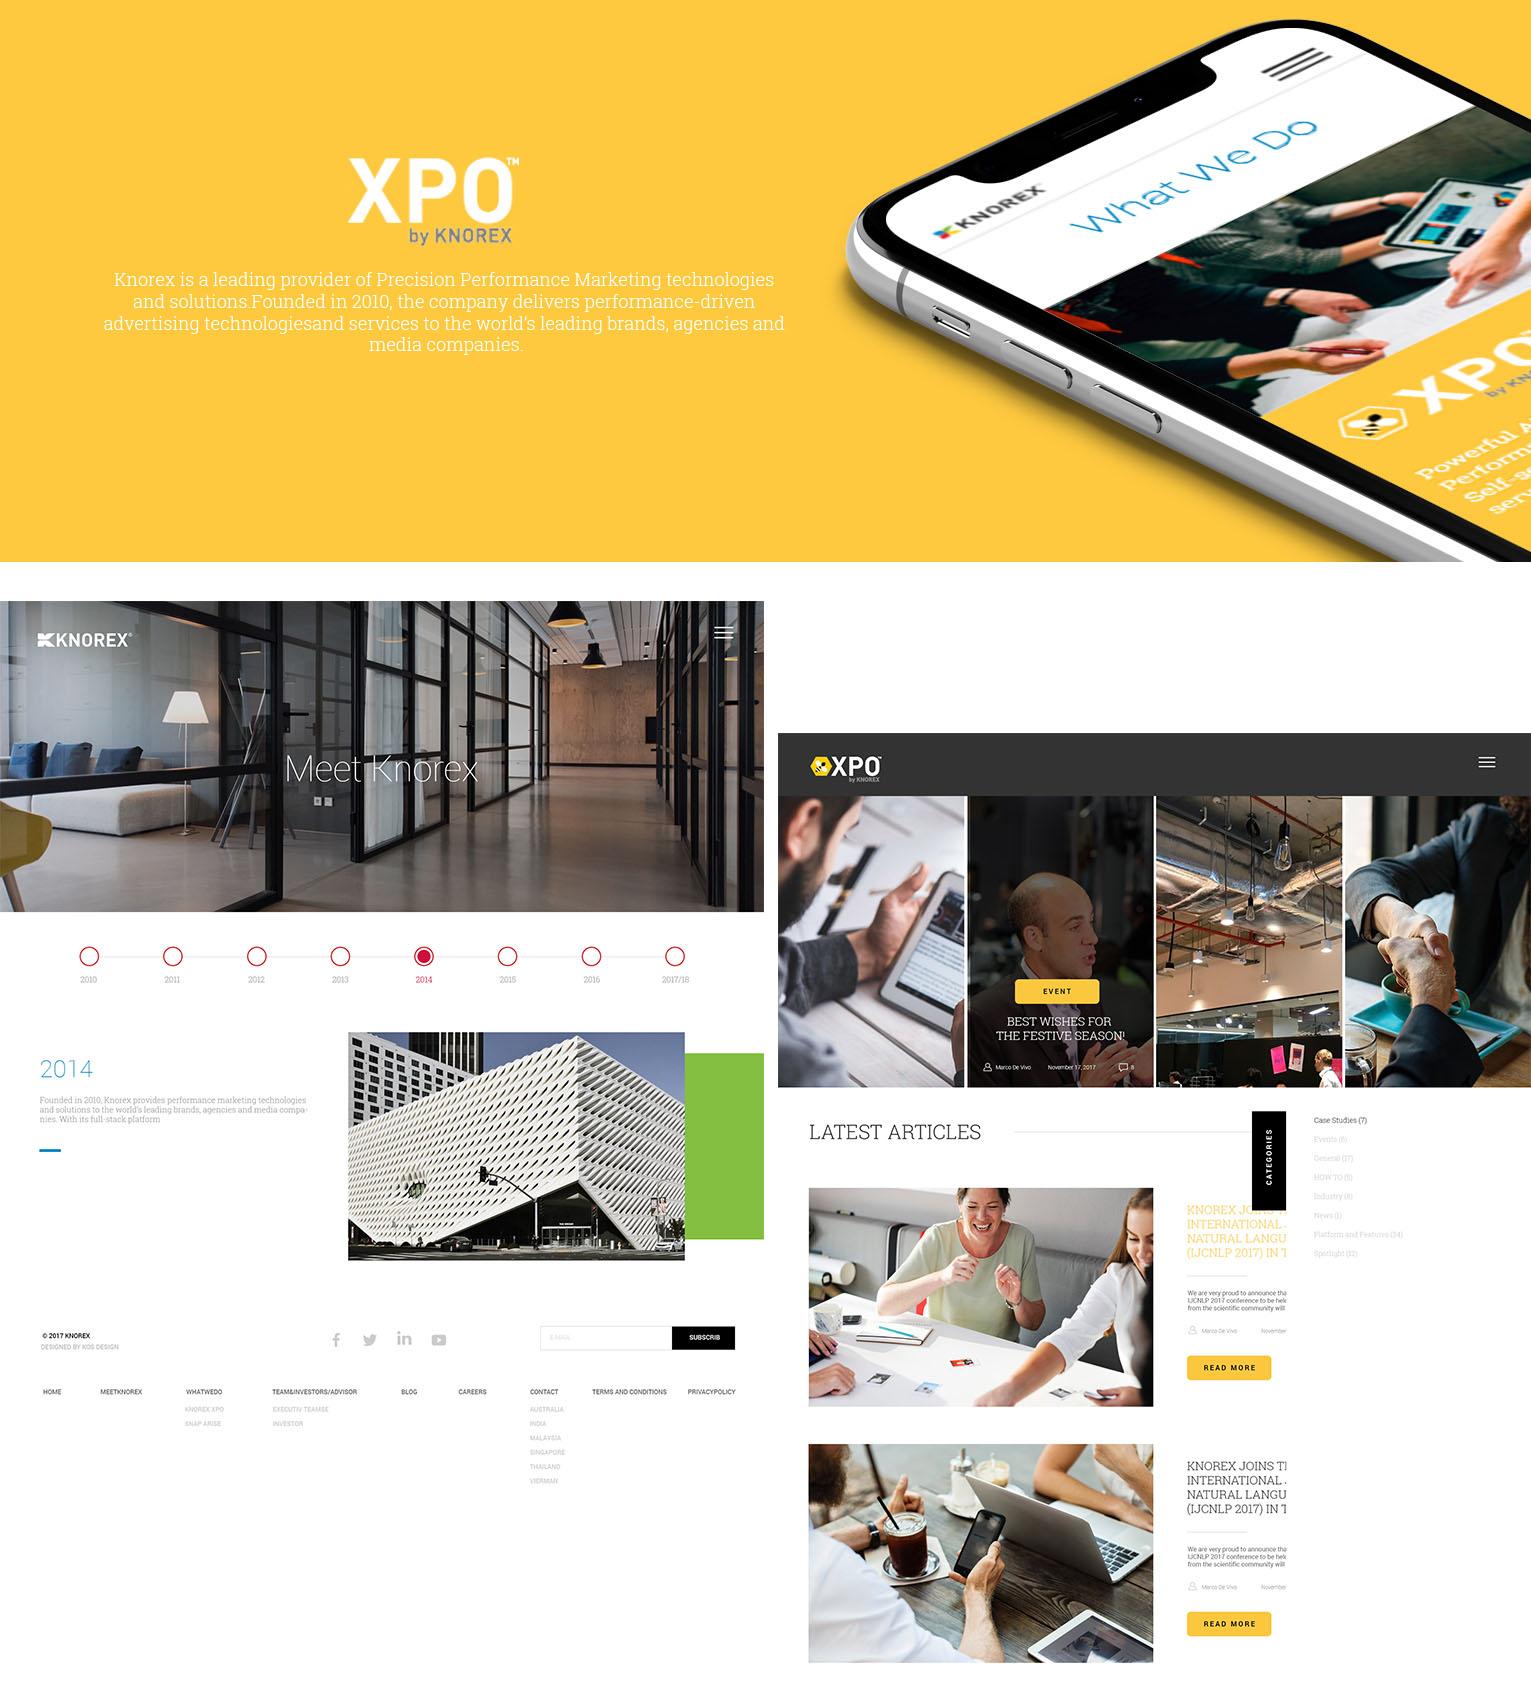 KOS Design - Knorex